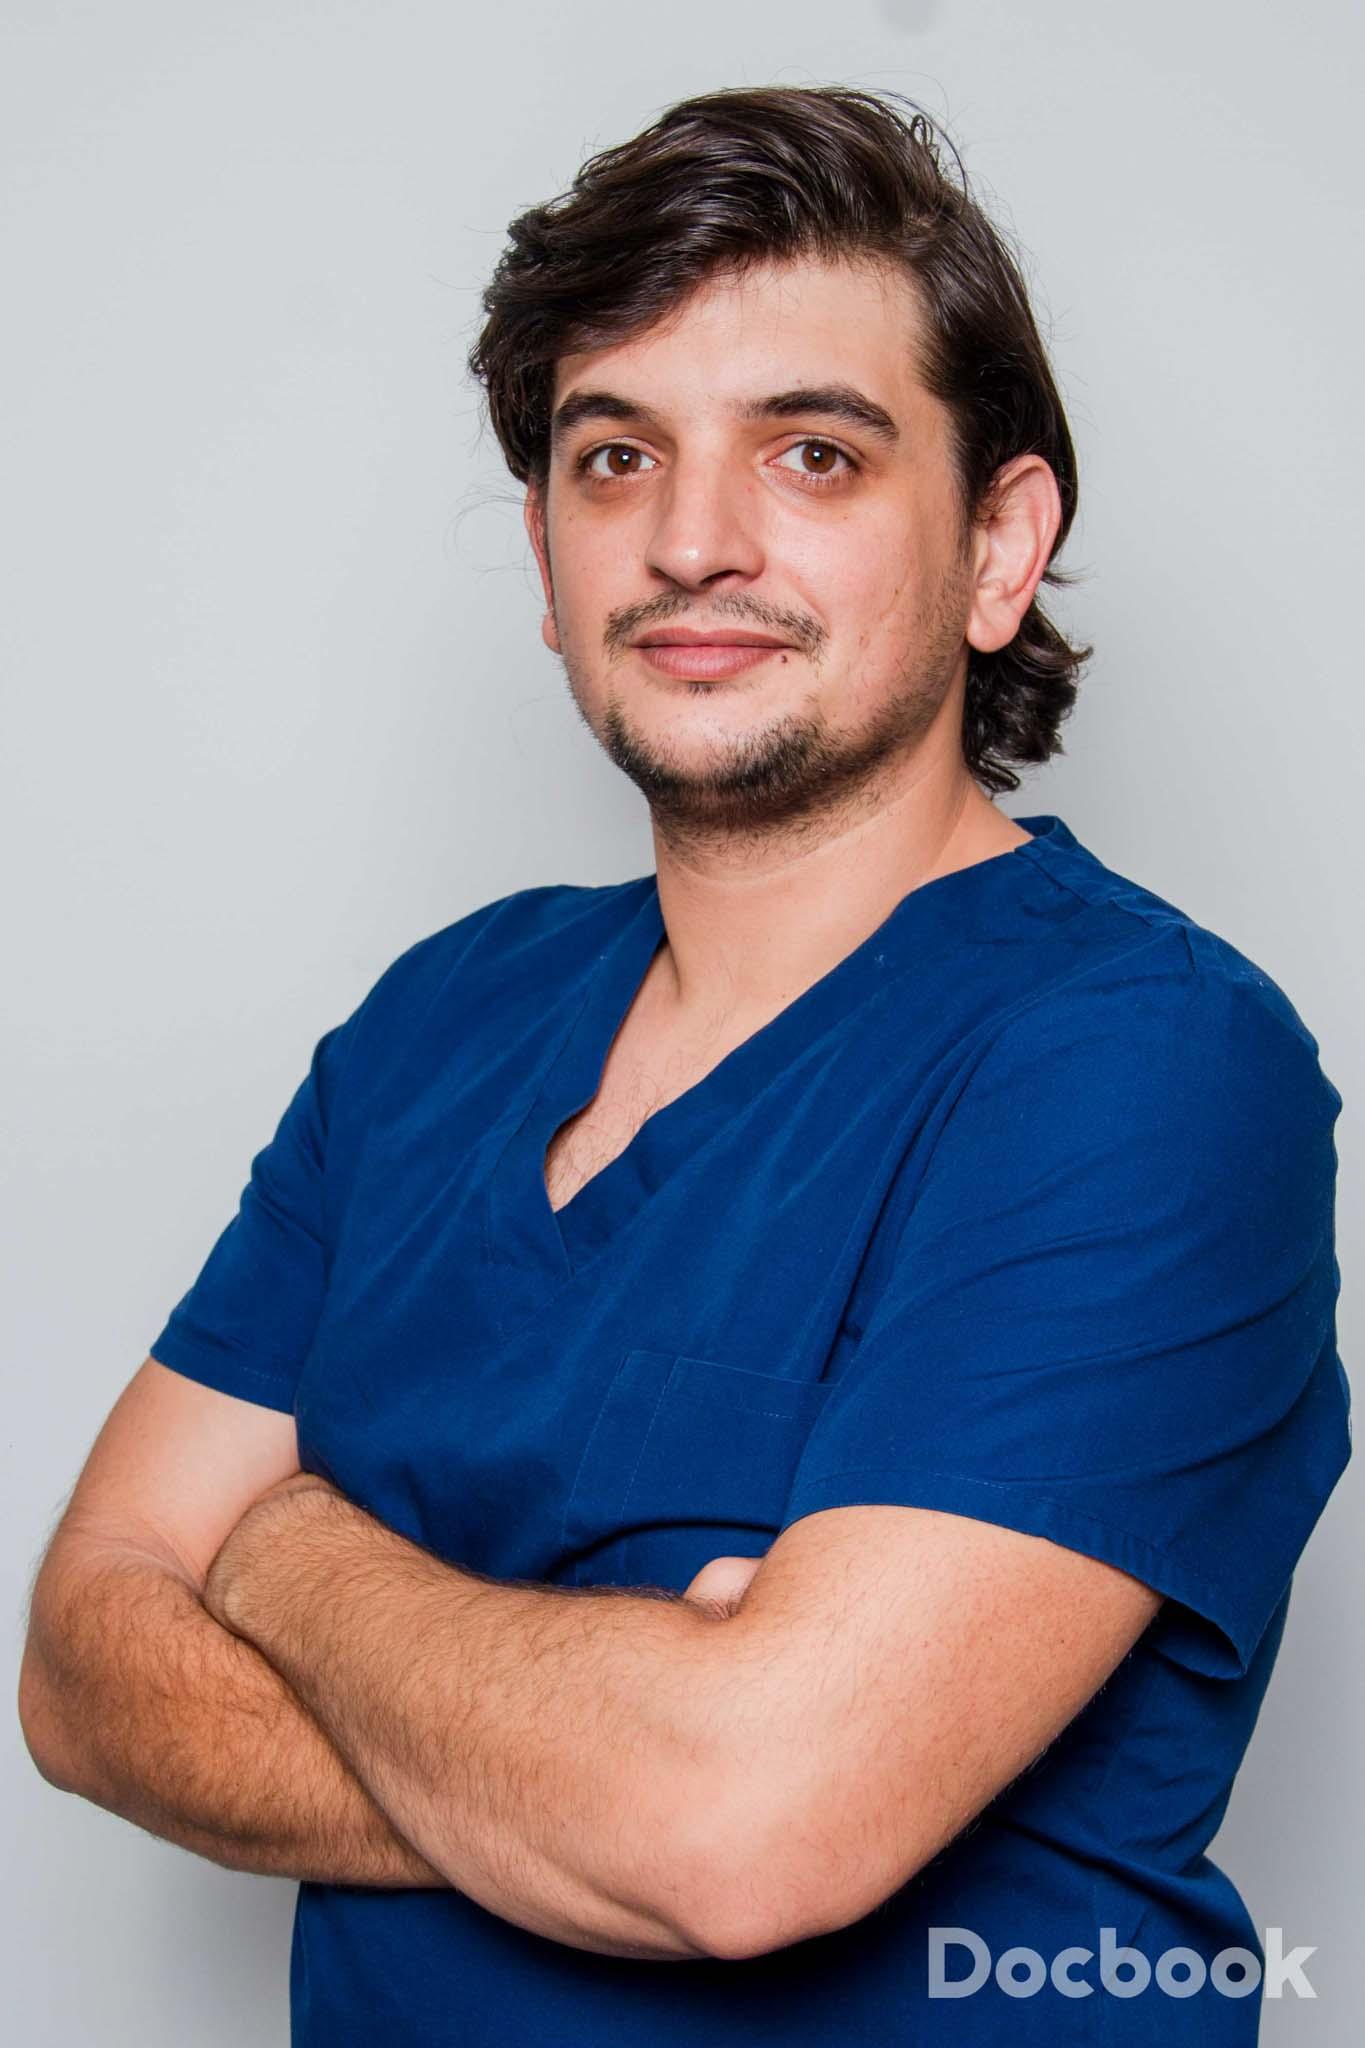 Dr. Bogdan Bacanu